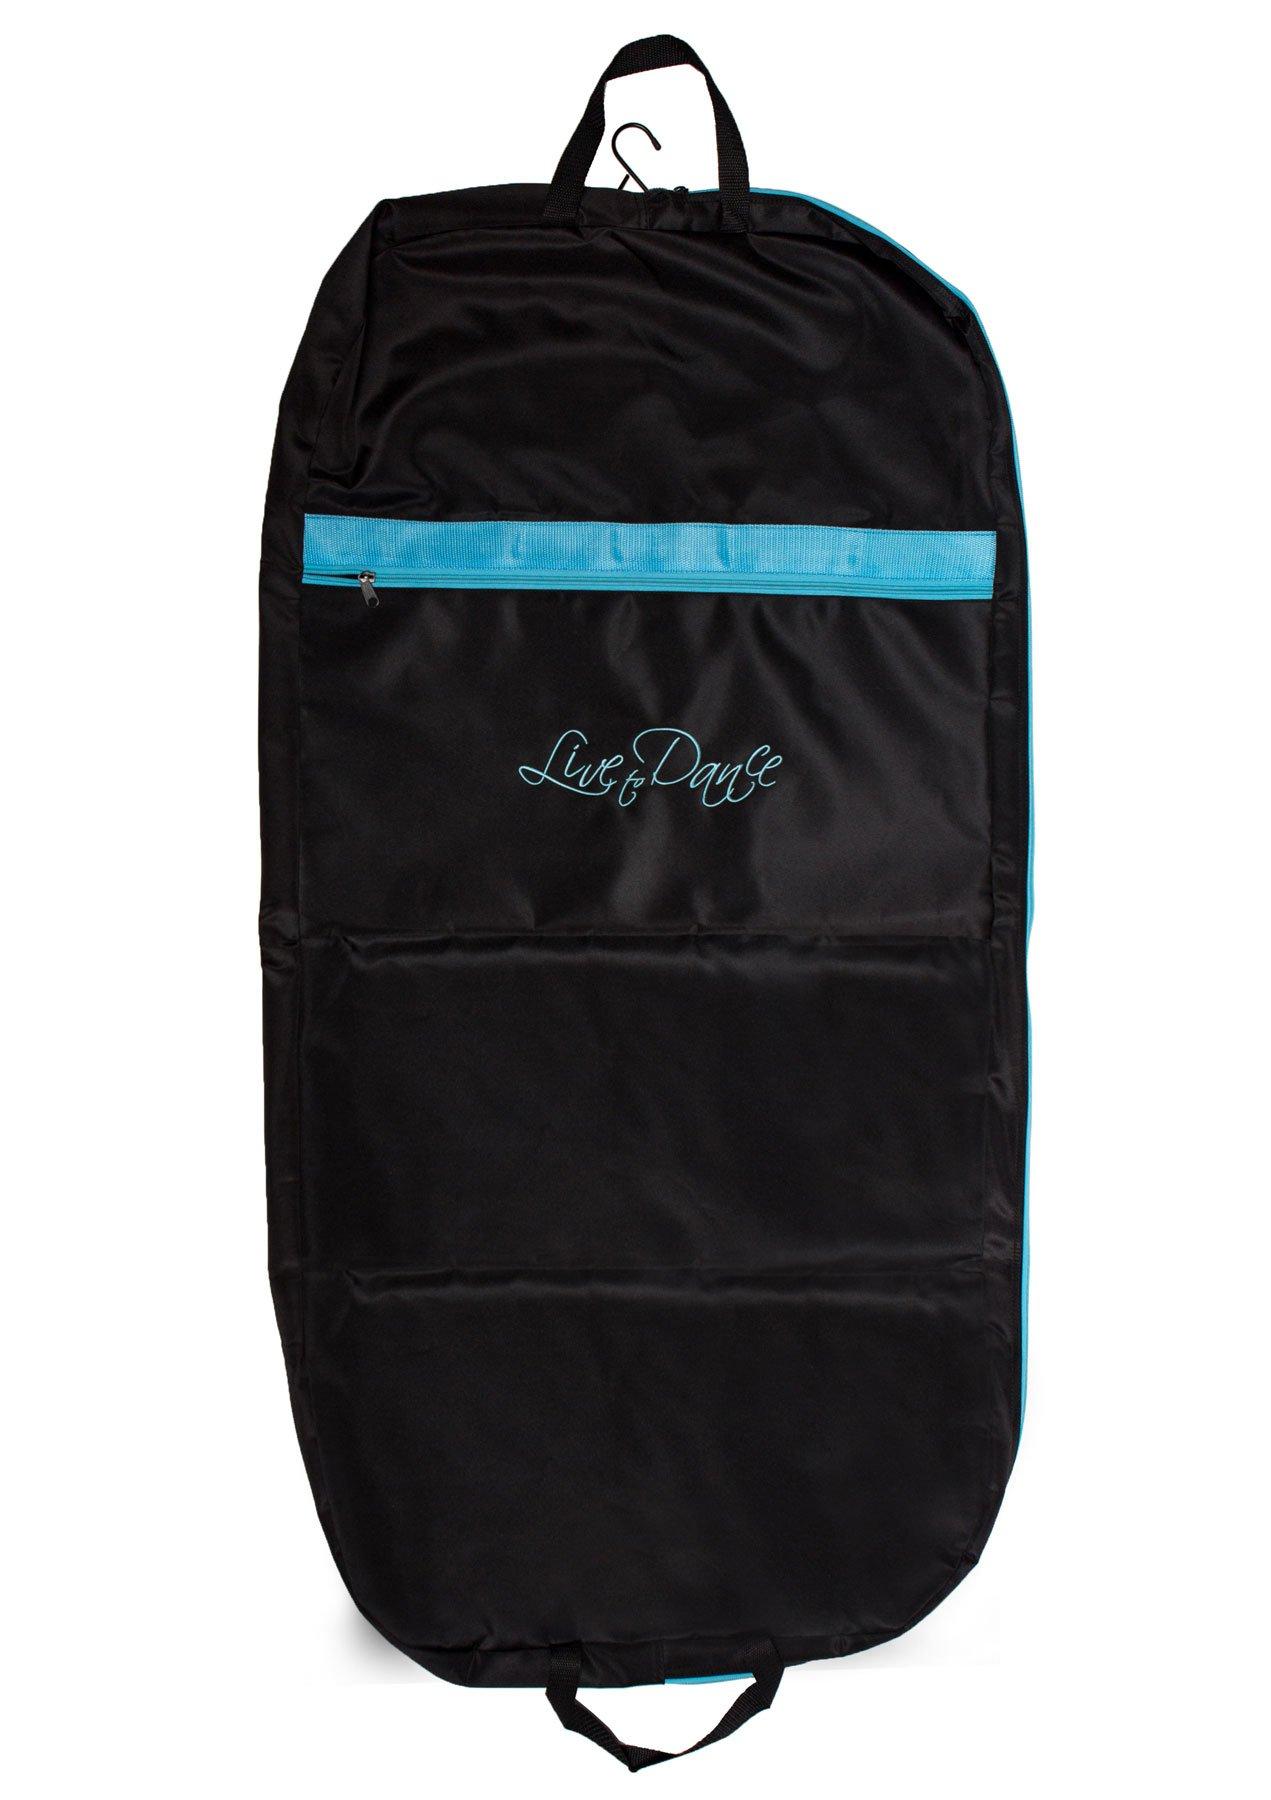 Horizon Dance 7047 Live To Dance Garment Bag For Dancers - Blue